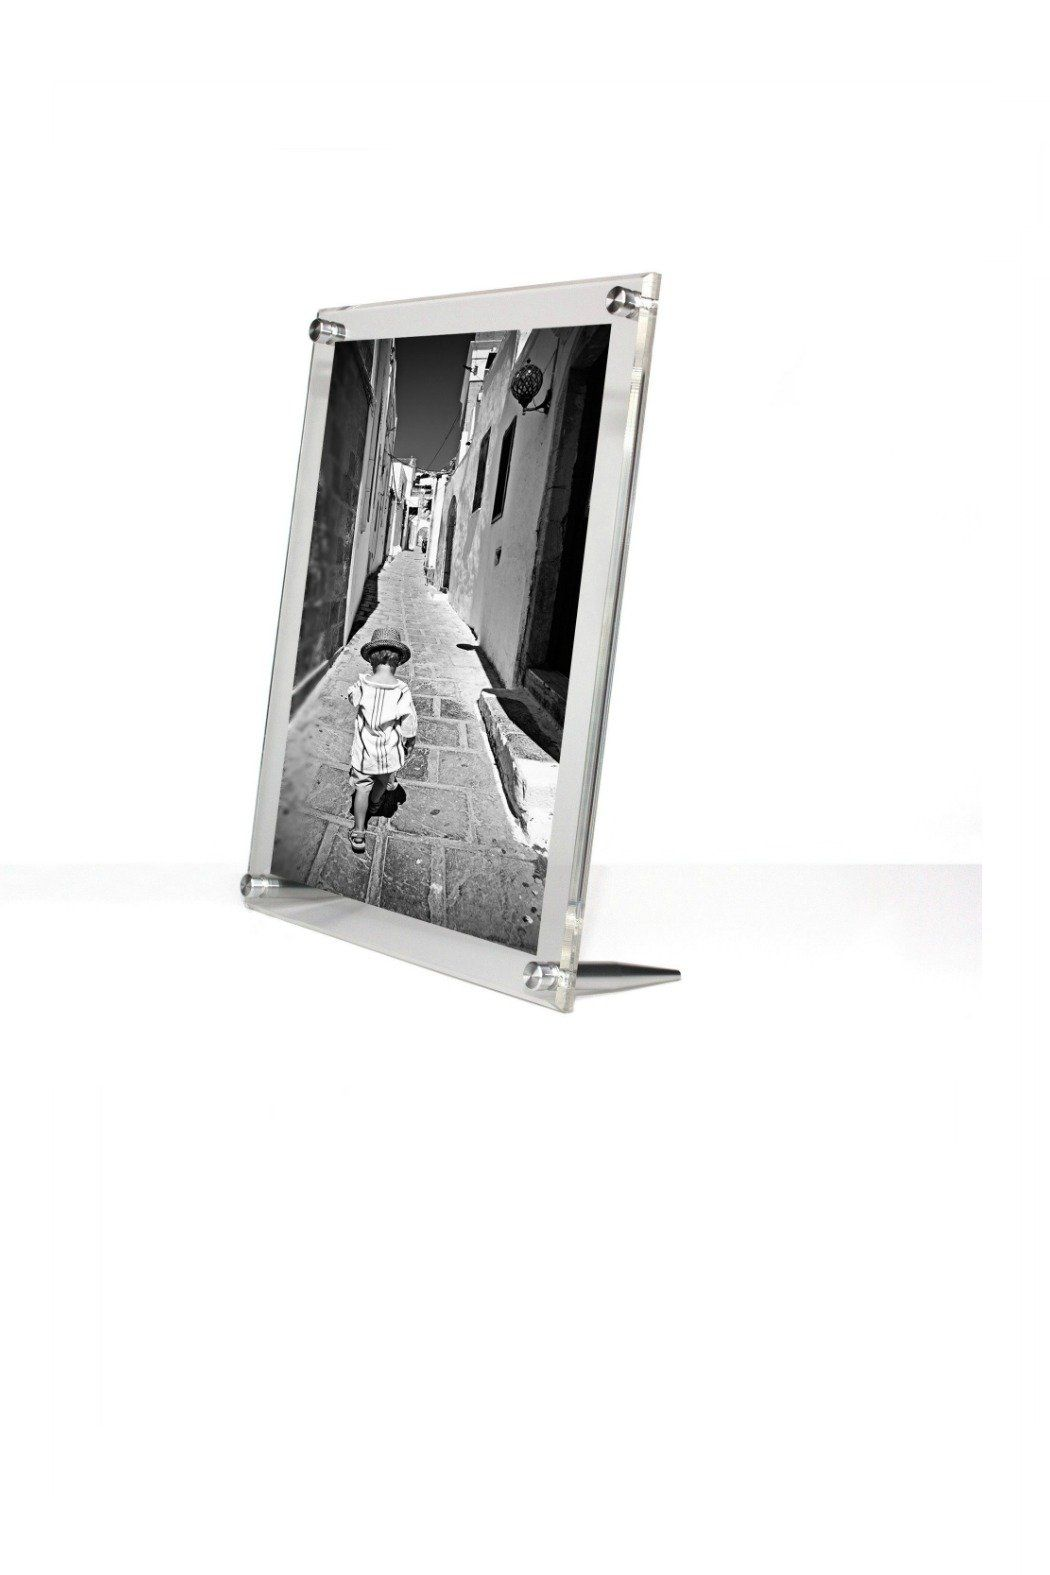 Acrylic Bevel Float Frame 8x10 Wall Frames Frame Floating